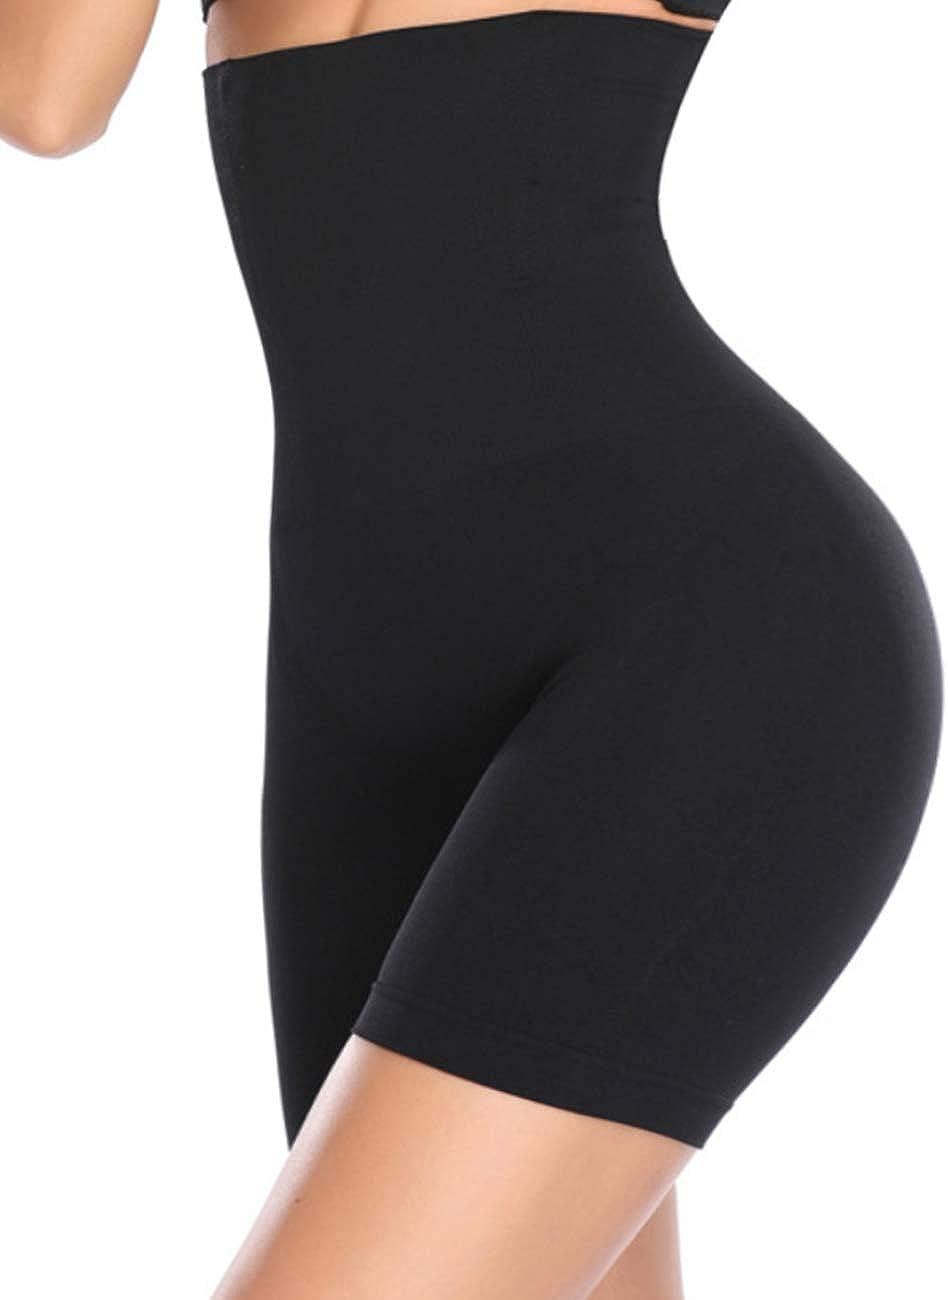 VENDAU Waist Shapewear Power Shorts Compression High Waisted Body Shaper Panties at  Women's Clothing store